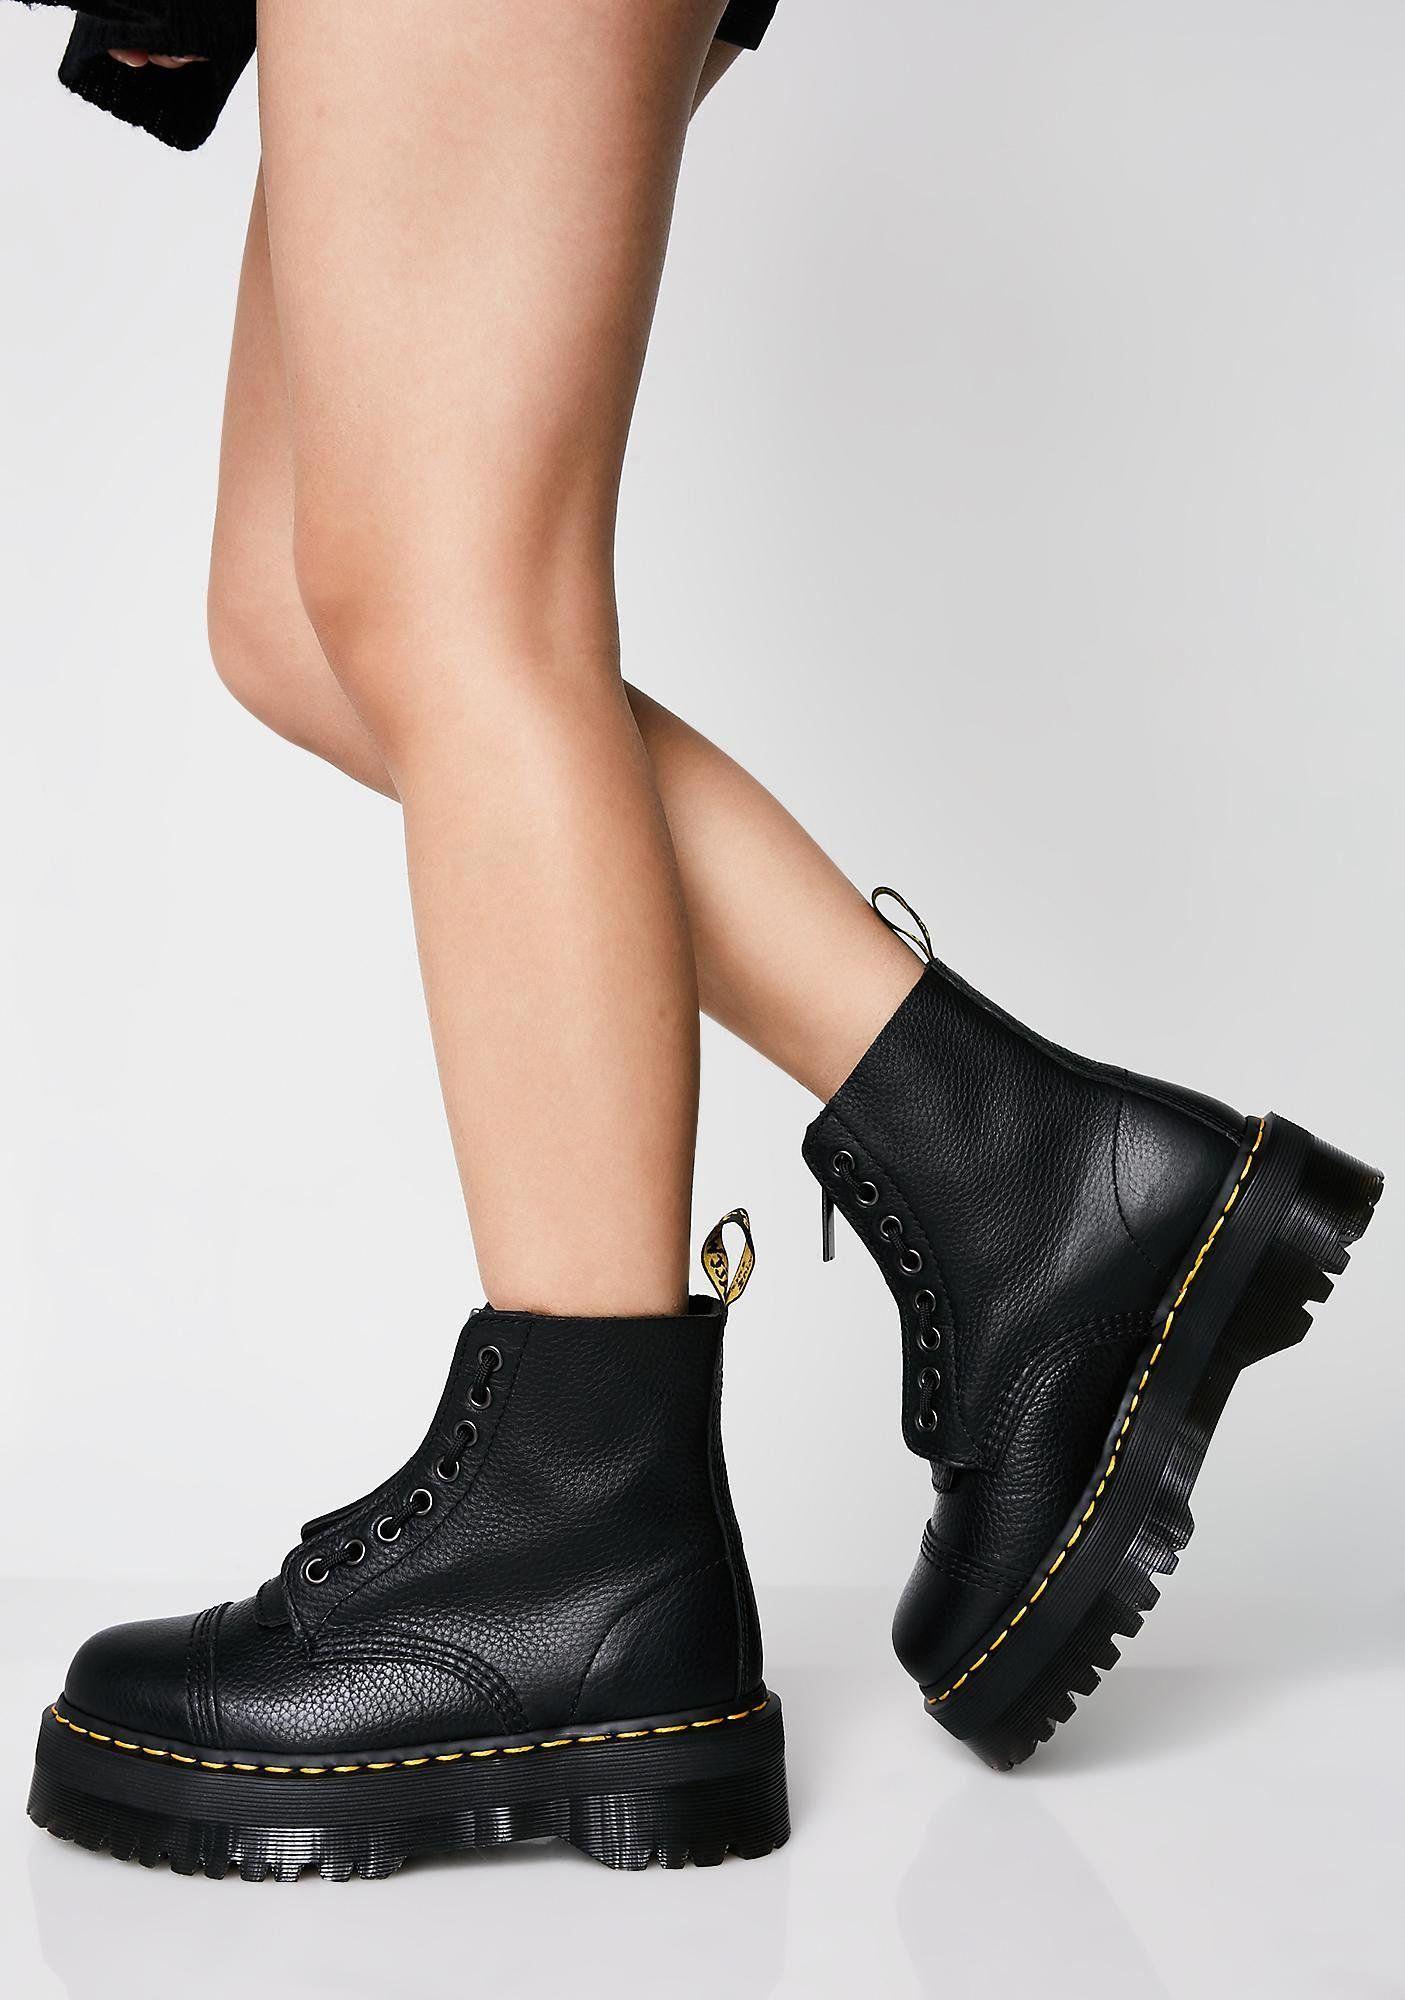 Dr. Martens Sinclair Jungle Boot | Boots, Jungle boots, Dr